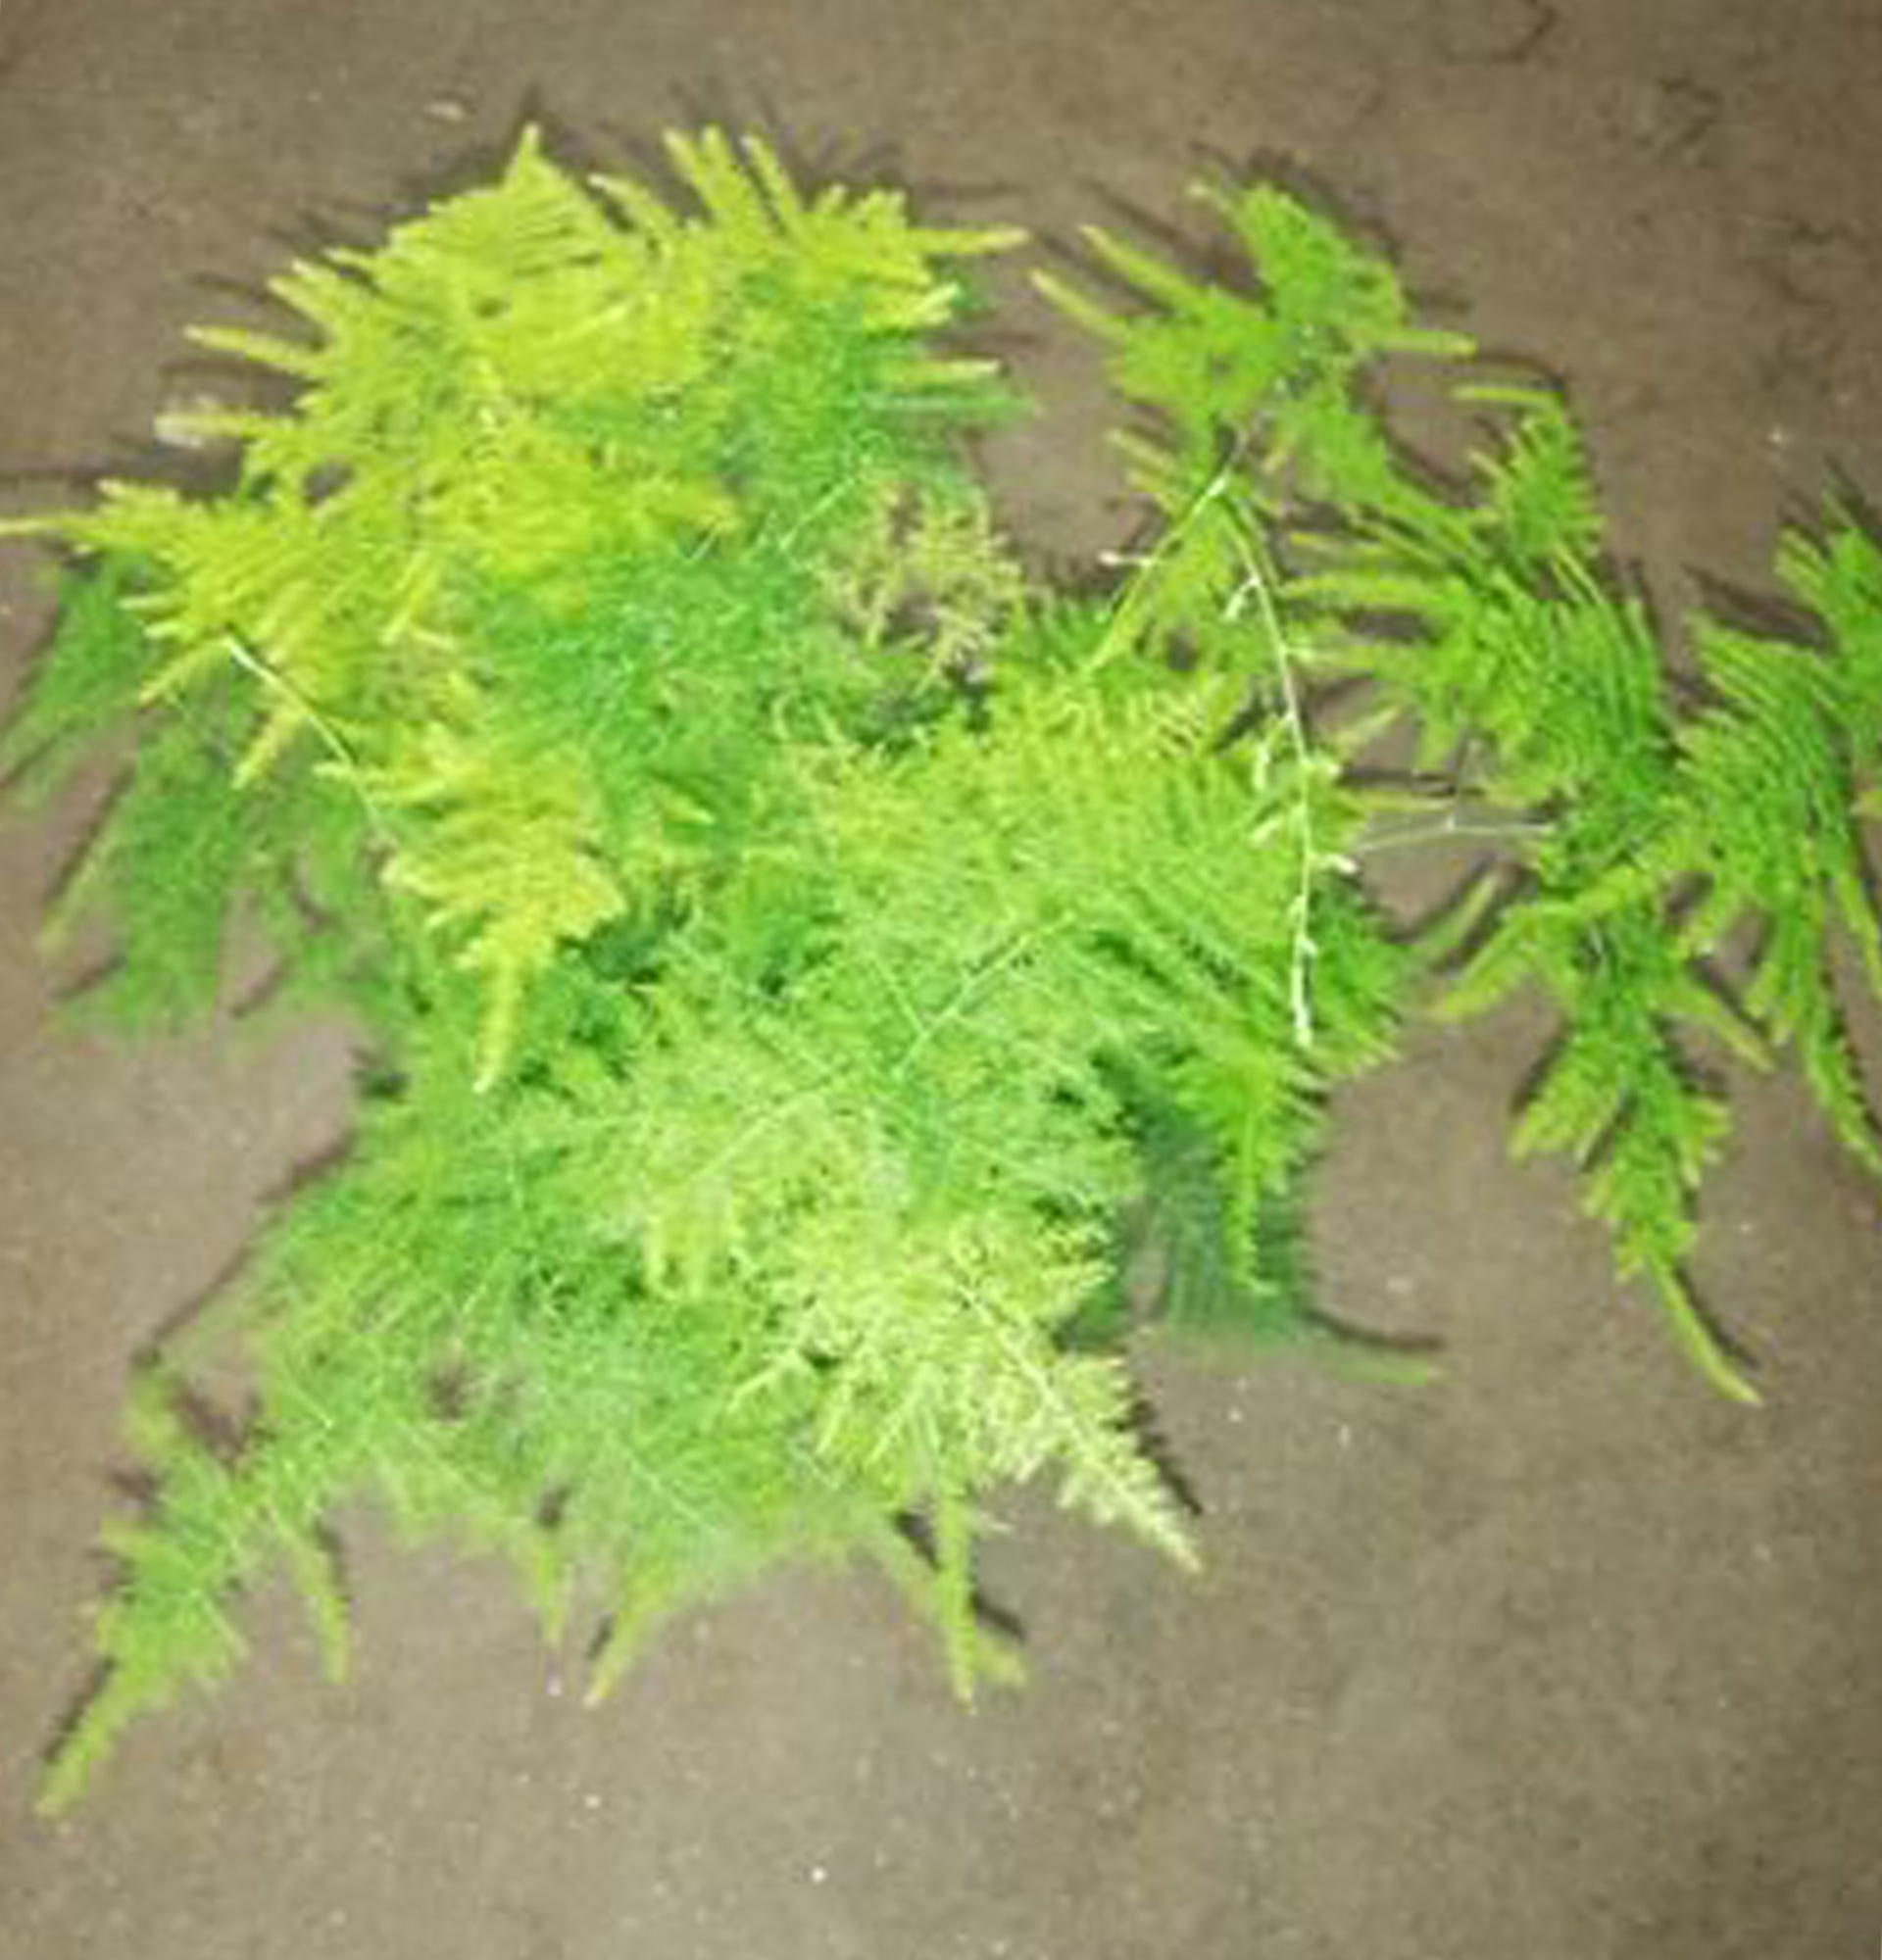 Аспарагус найтонший фото (Asparagus benuissimus)